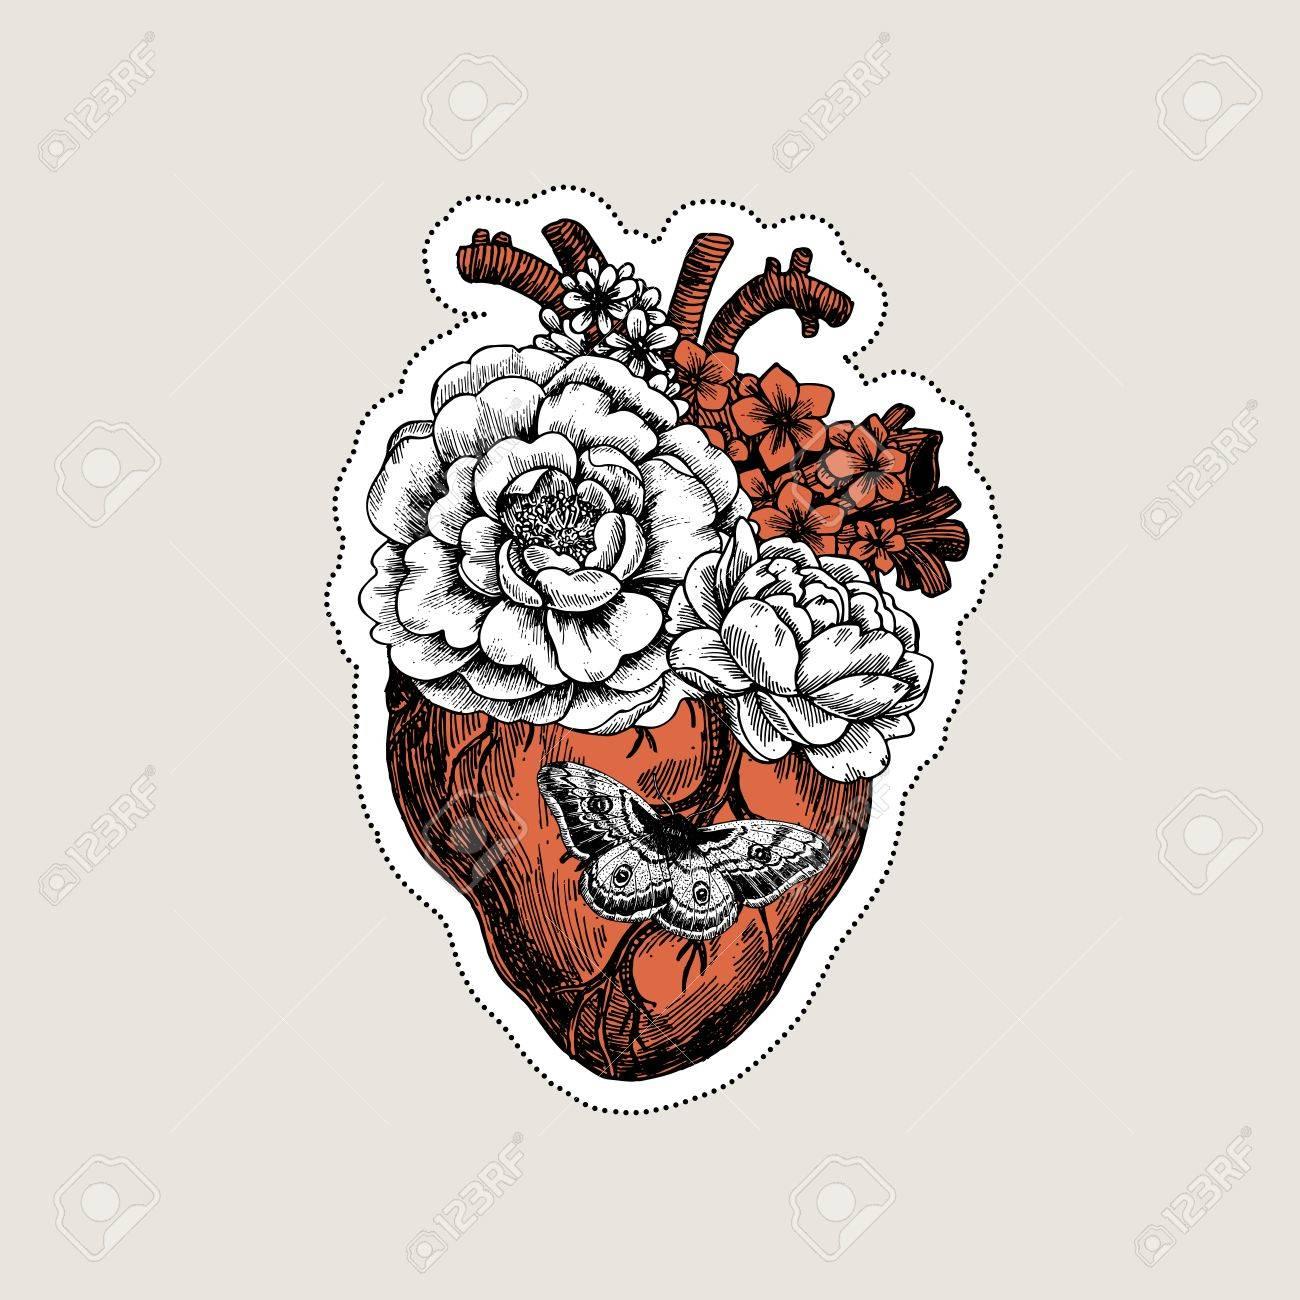 vintage red real heart diagram 2000 civic si fuse box anatomical drawing at getdrawings free